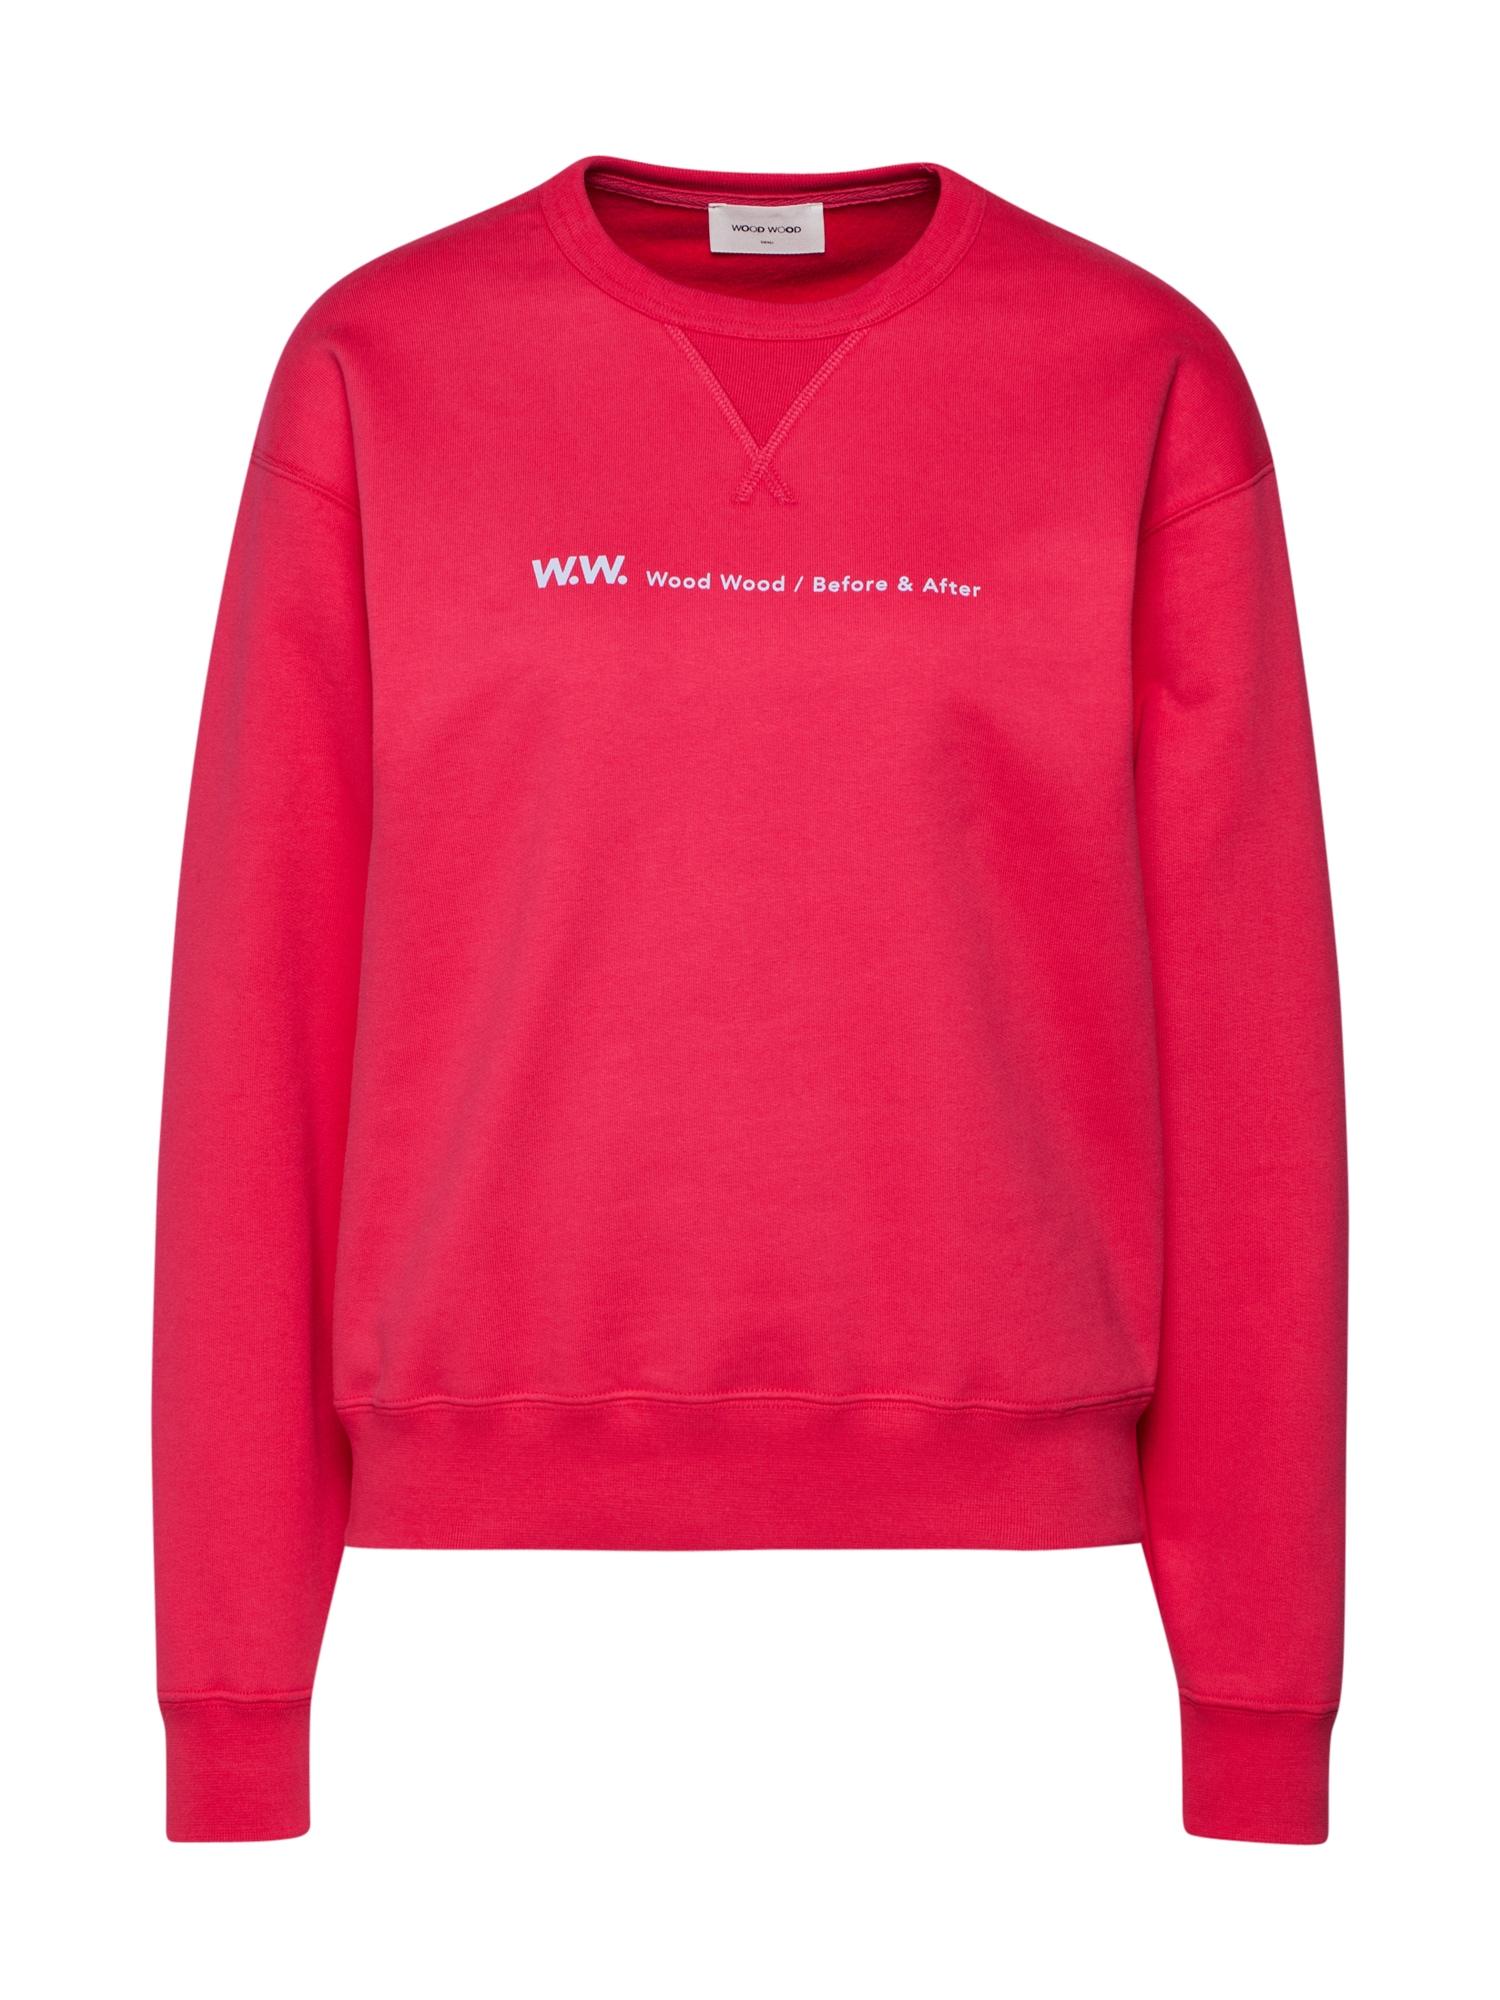 WOOD WOOD, Dames Sweatshirt 'FLORA', framboos